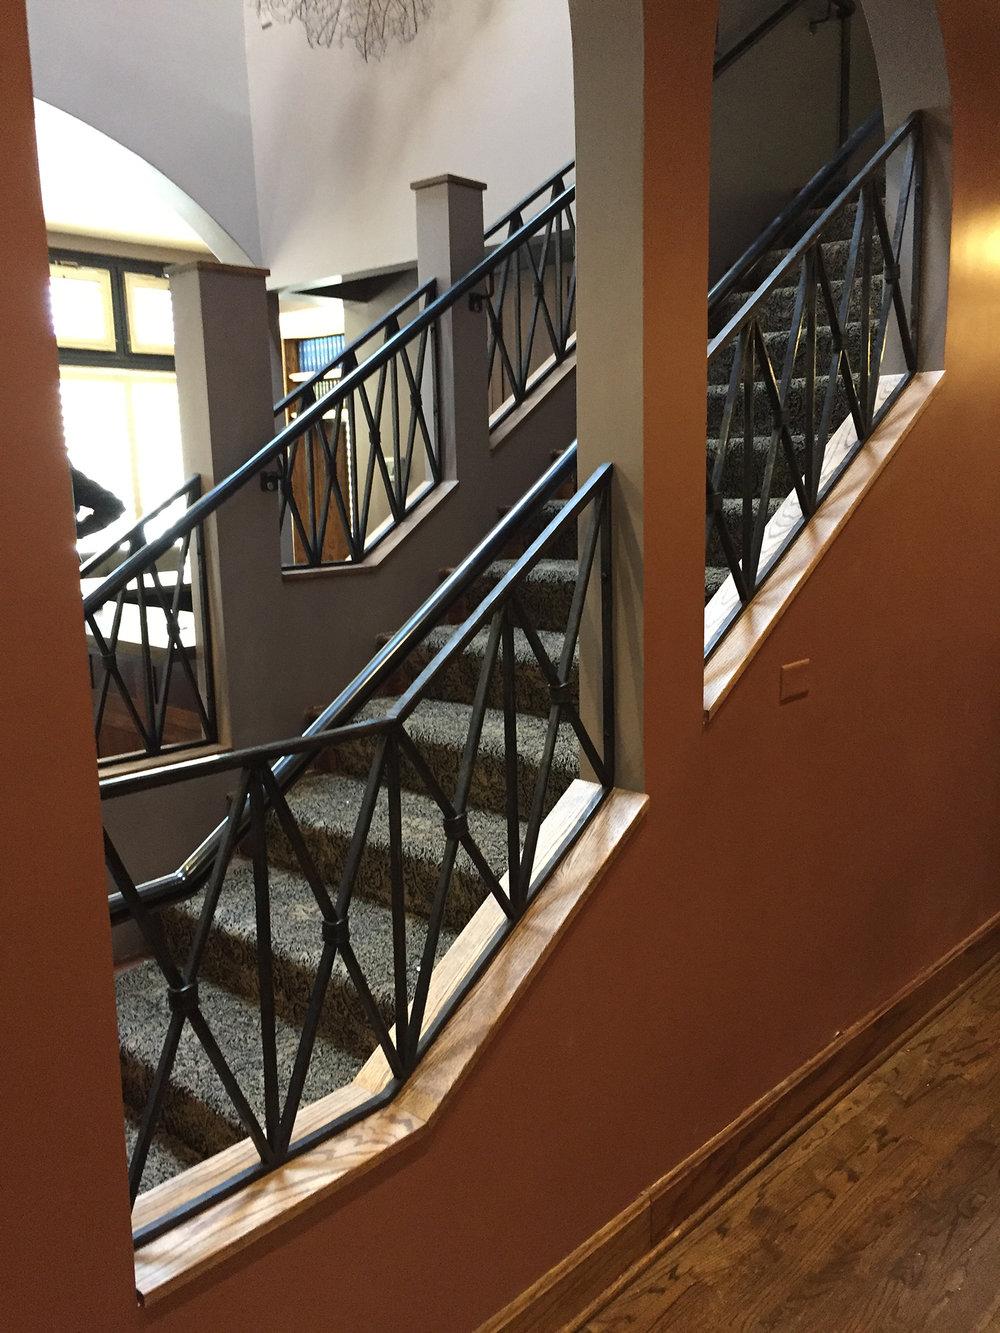 The Cactus Club Staircase Railing